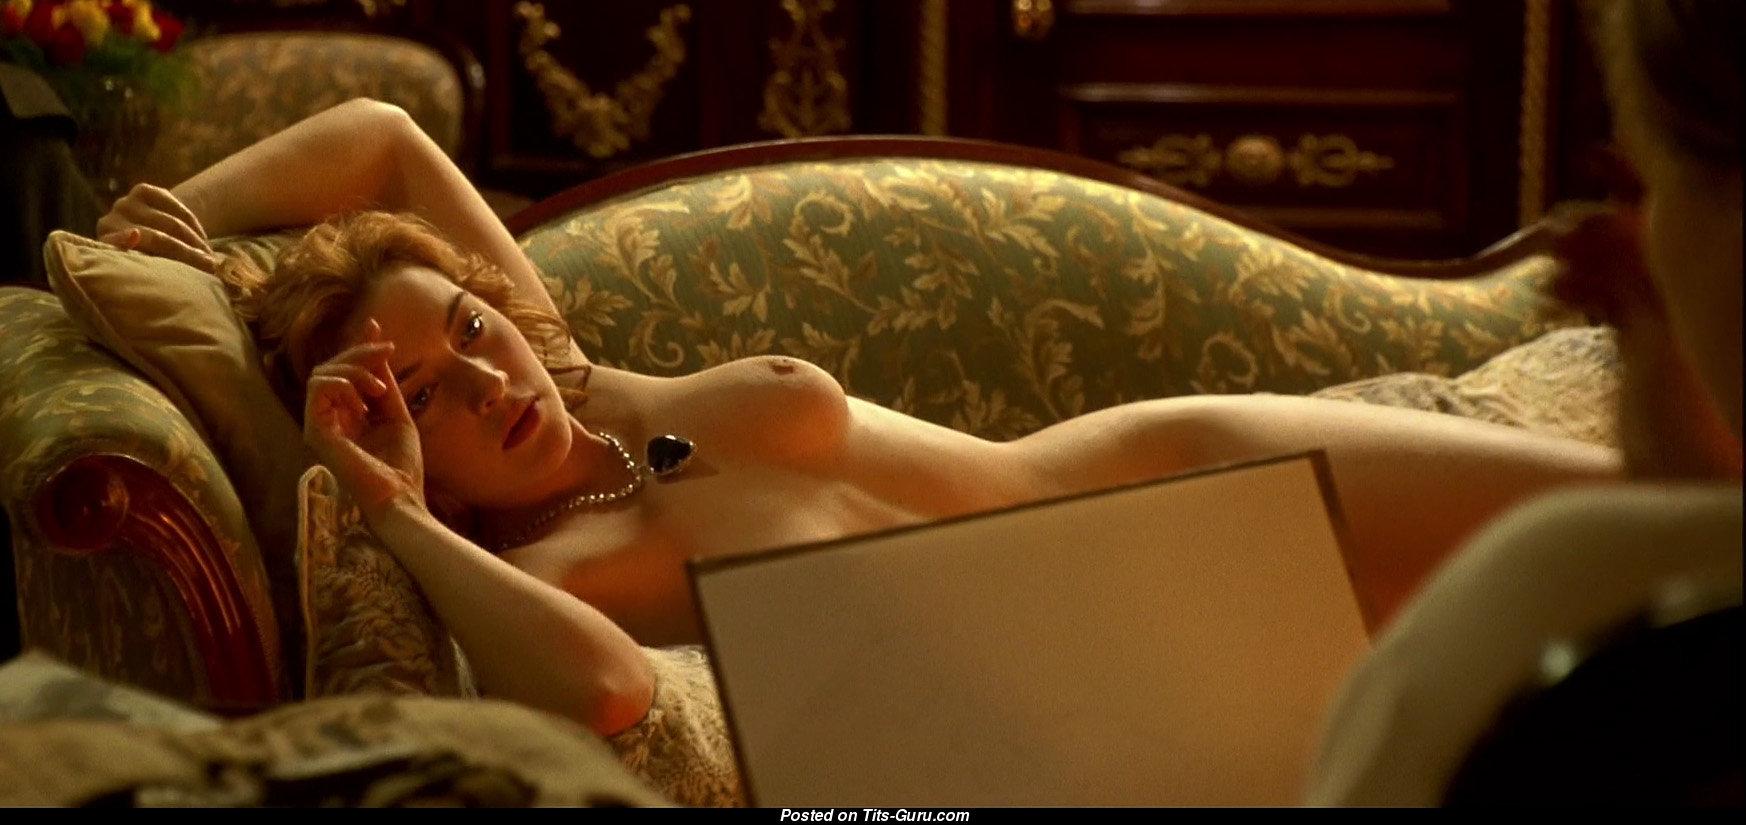 titanic movie hot drawing scene